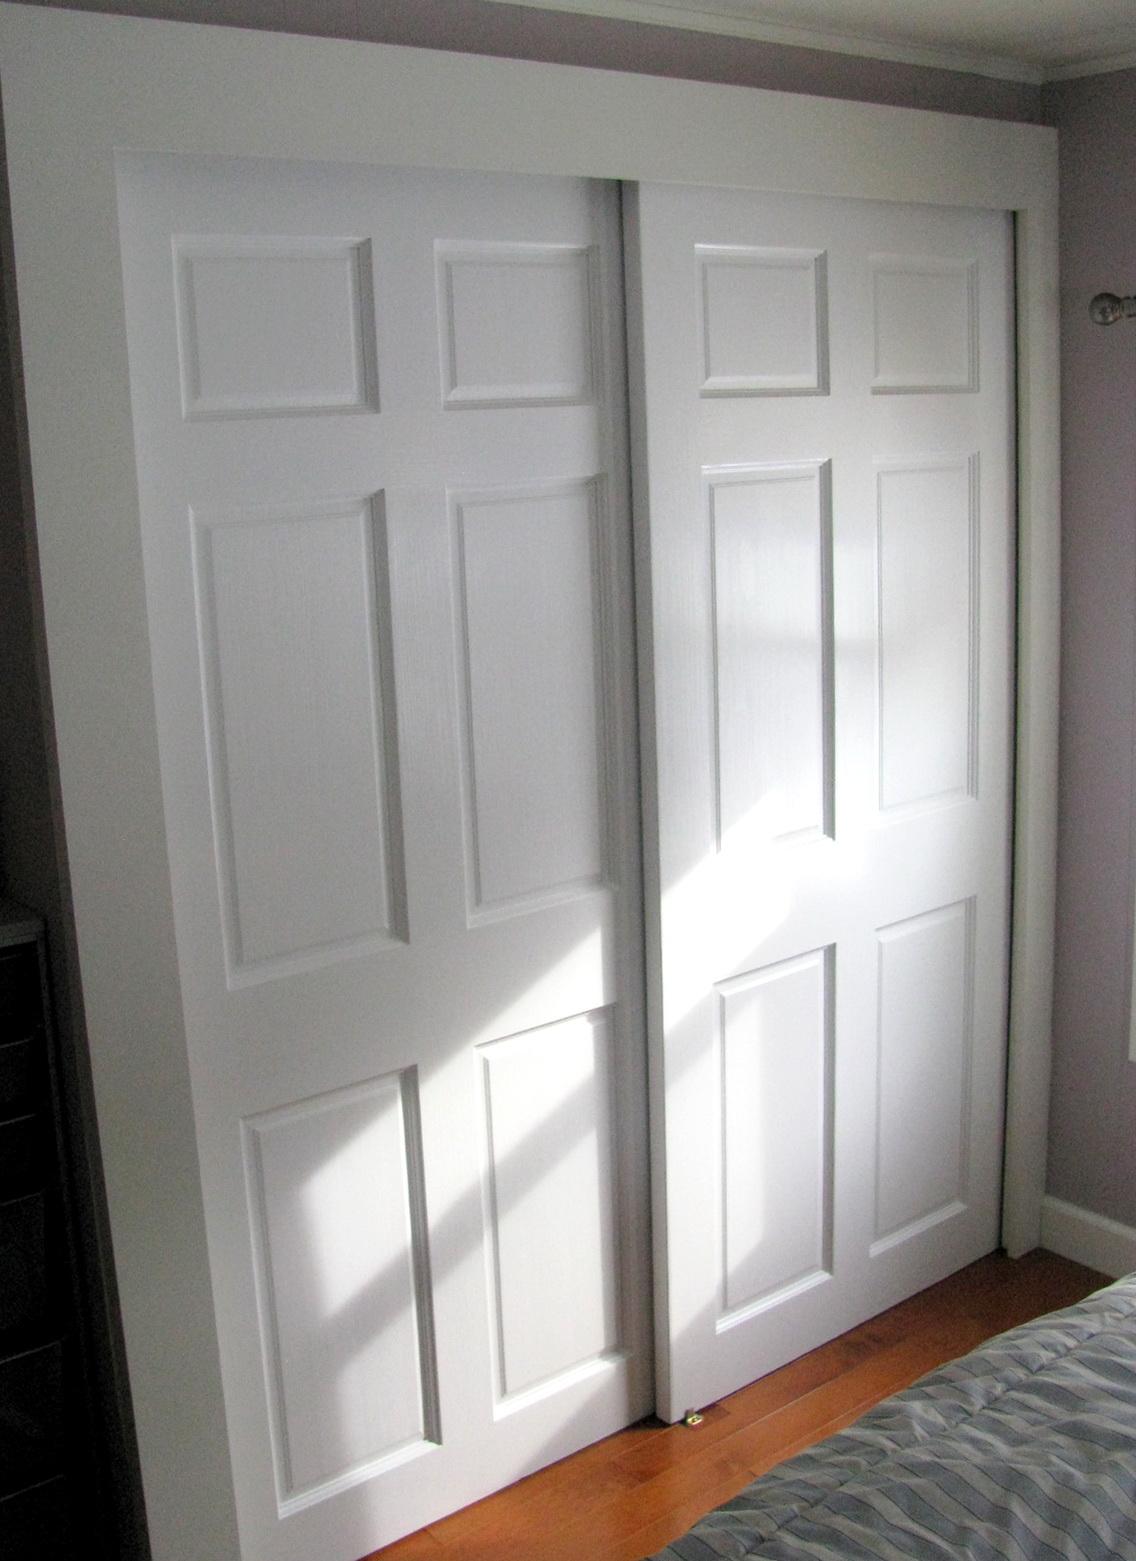 Bypass Closet Doors For Bedrooms Home Design Ideas